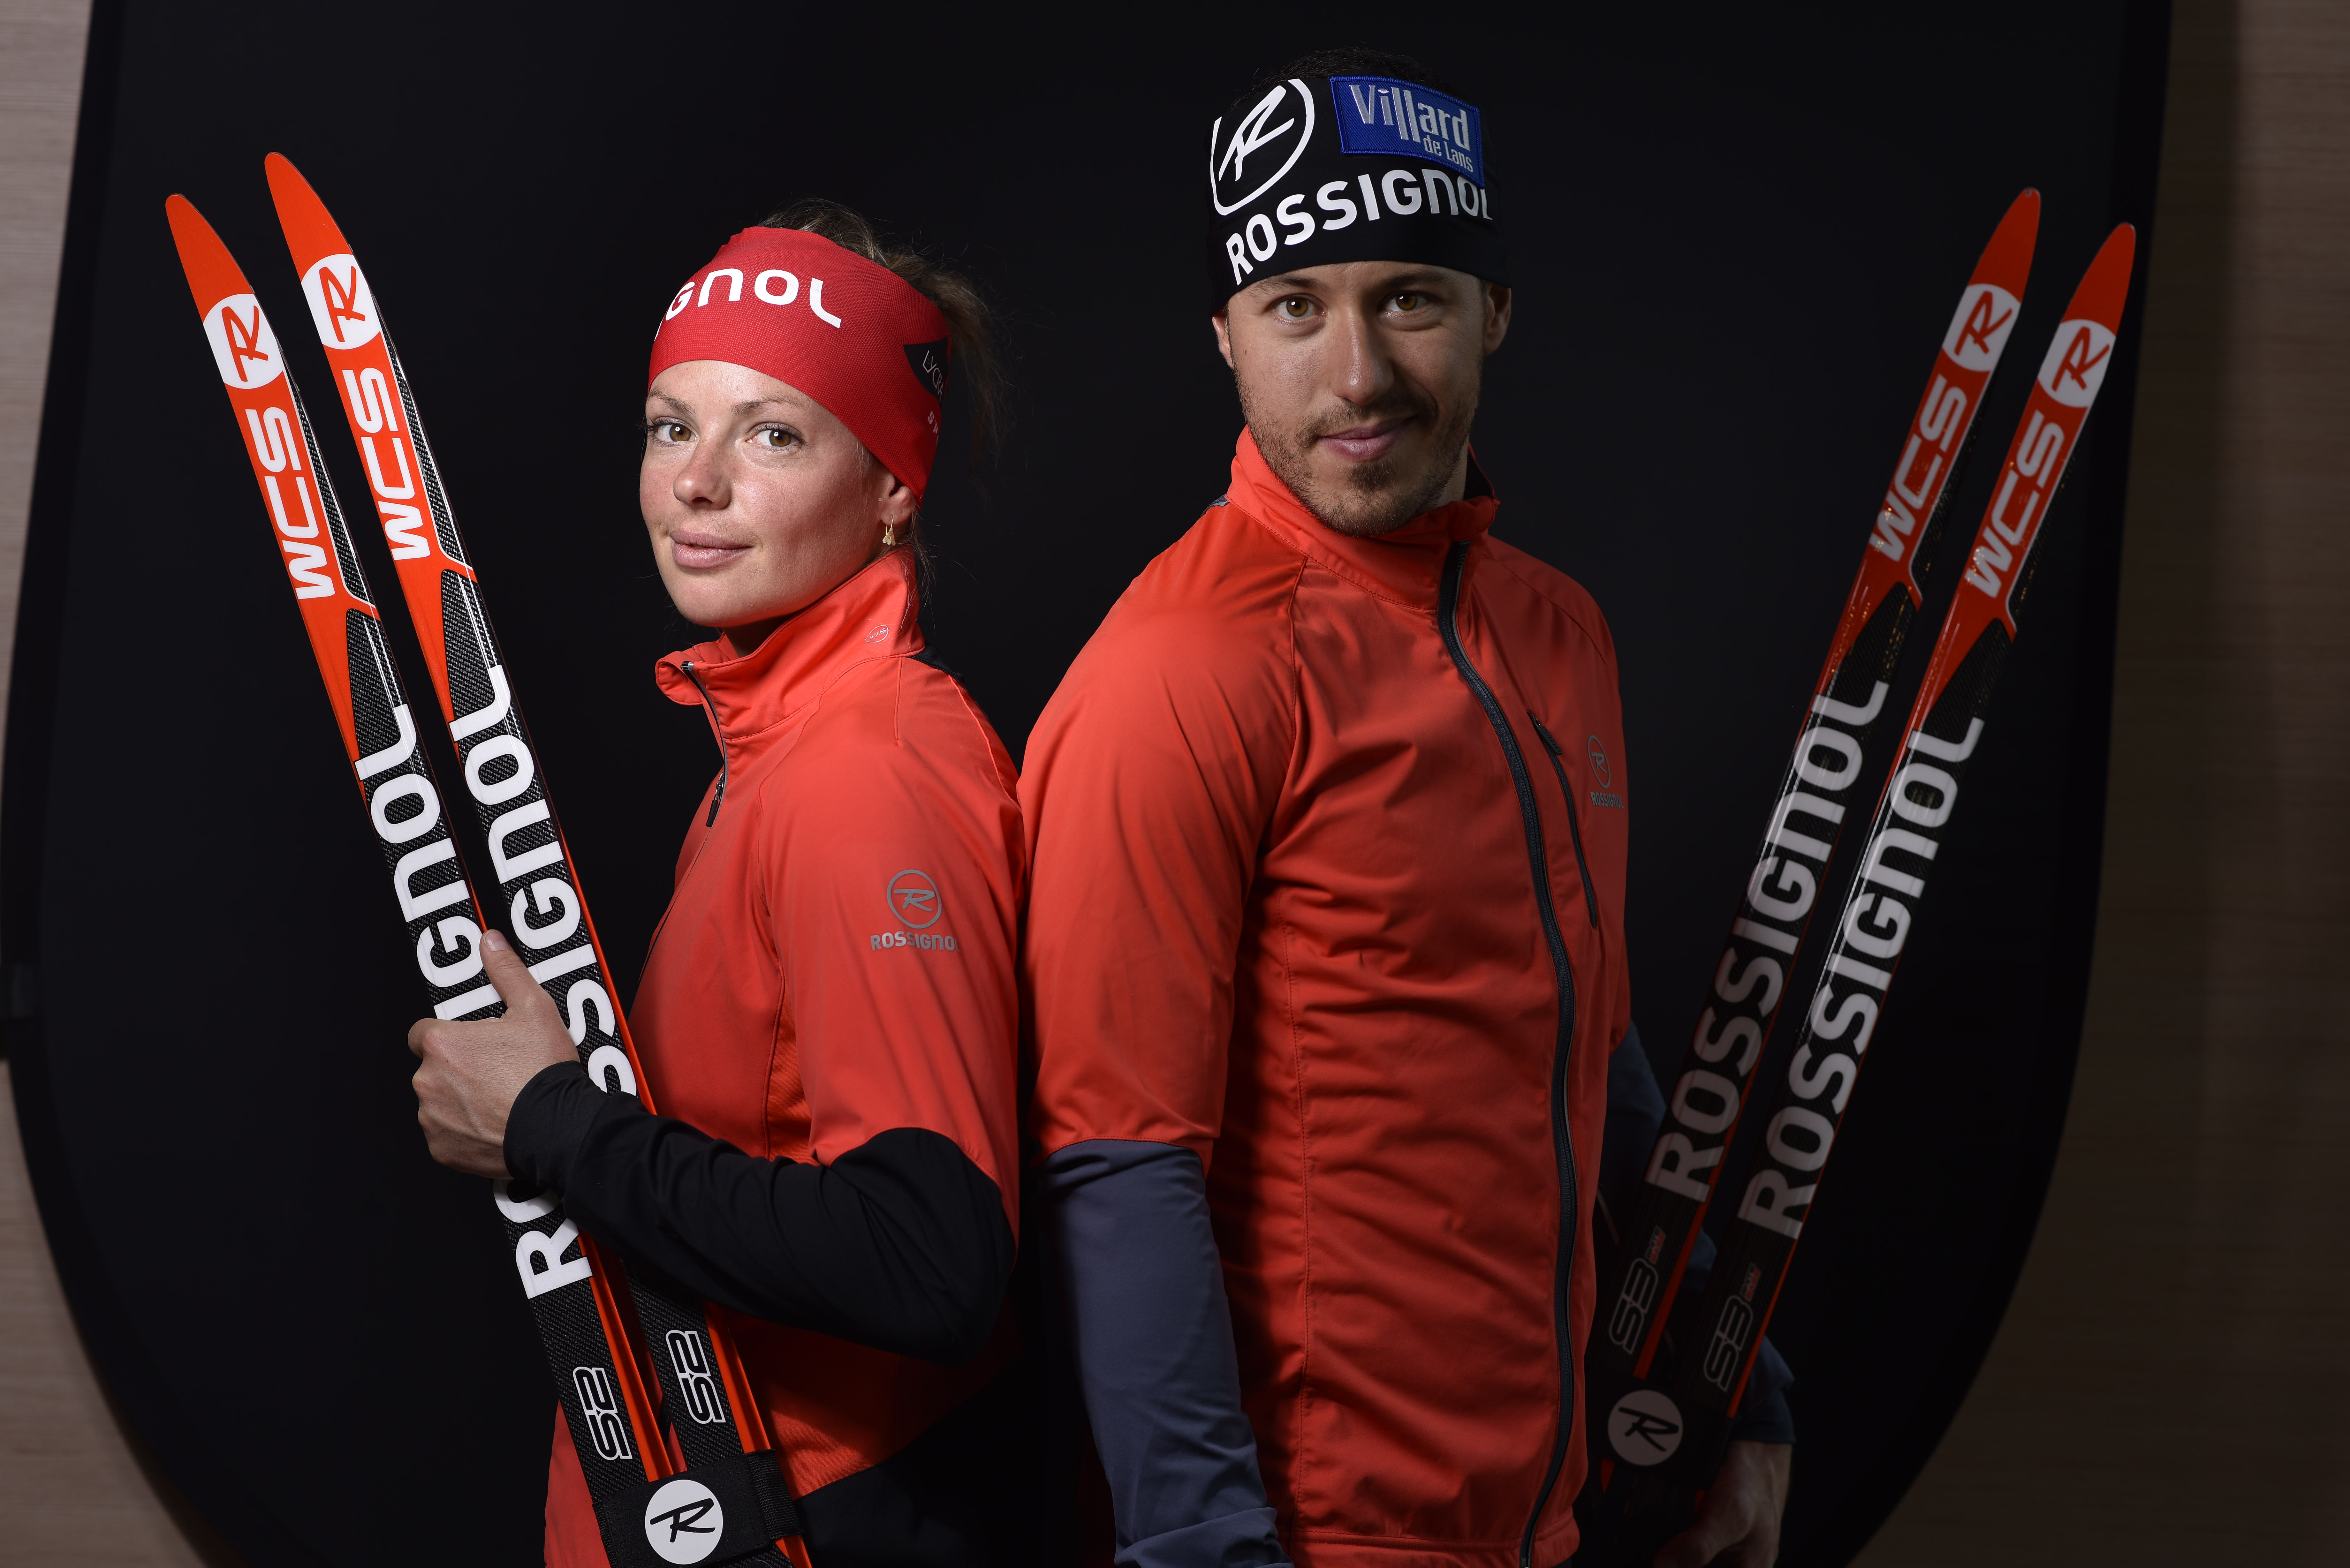 Guides alpin matériel matériel de fond Ski Ski Fiches wkOuTPXZil